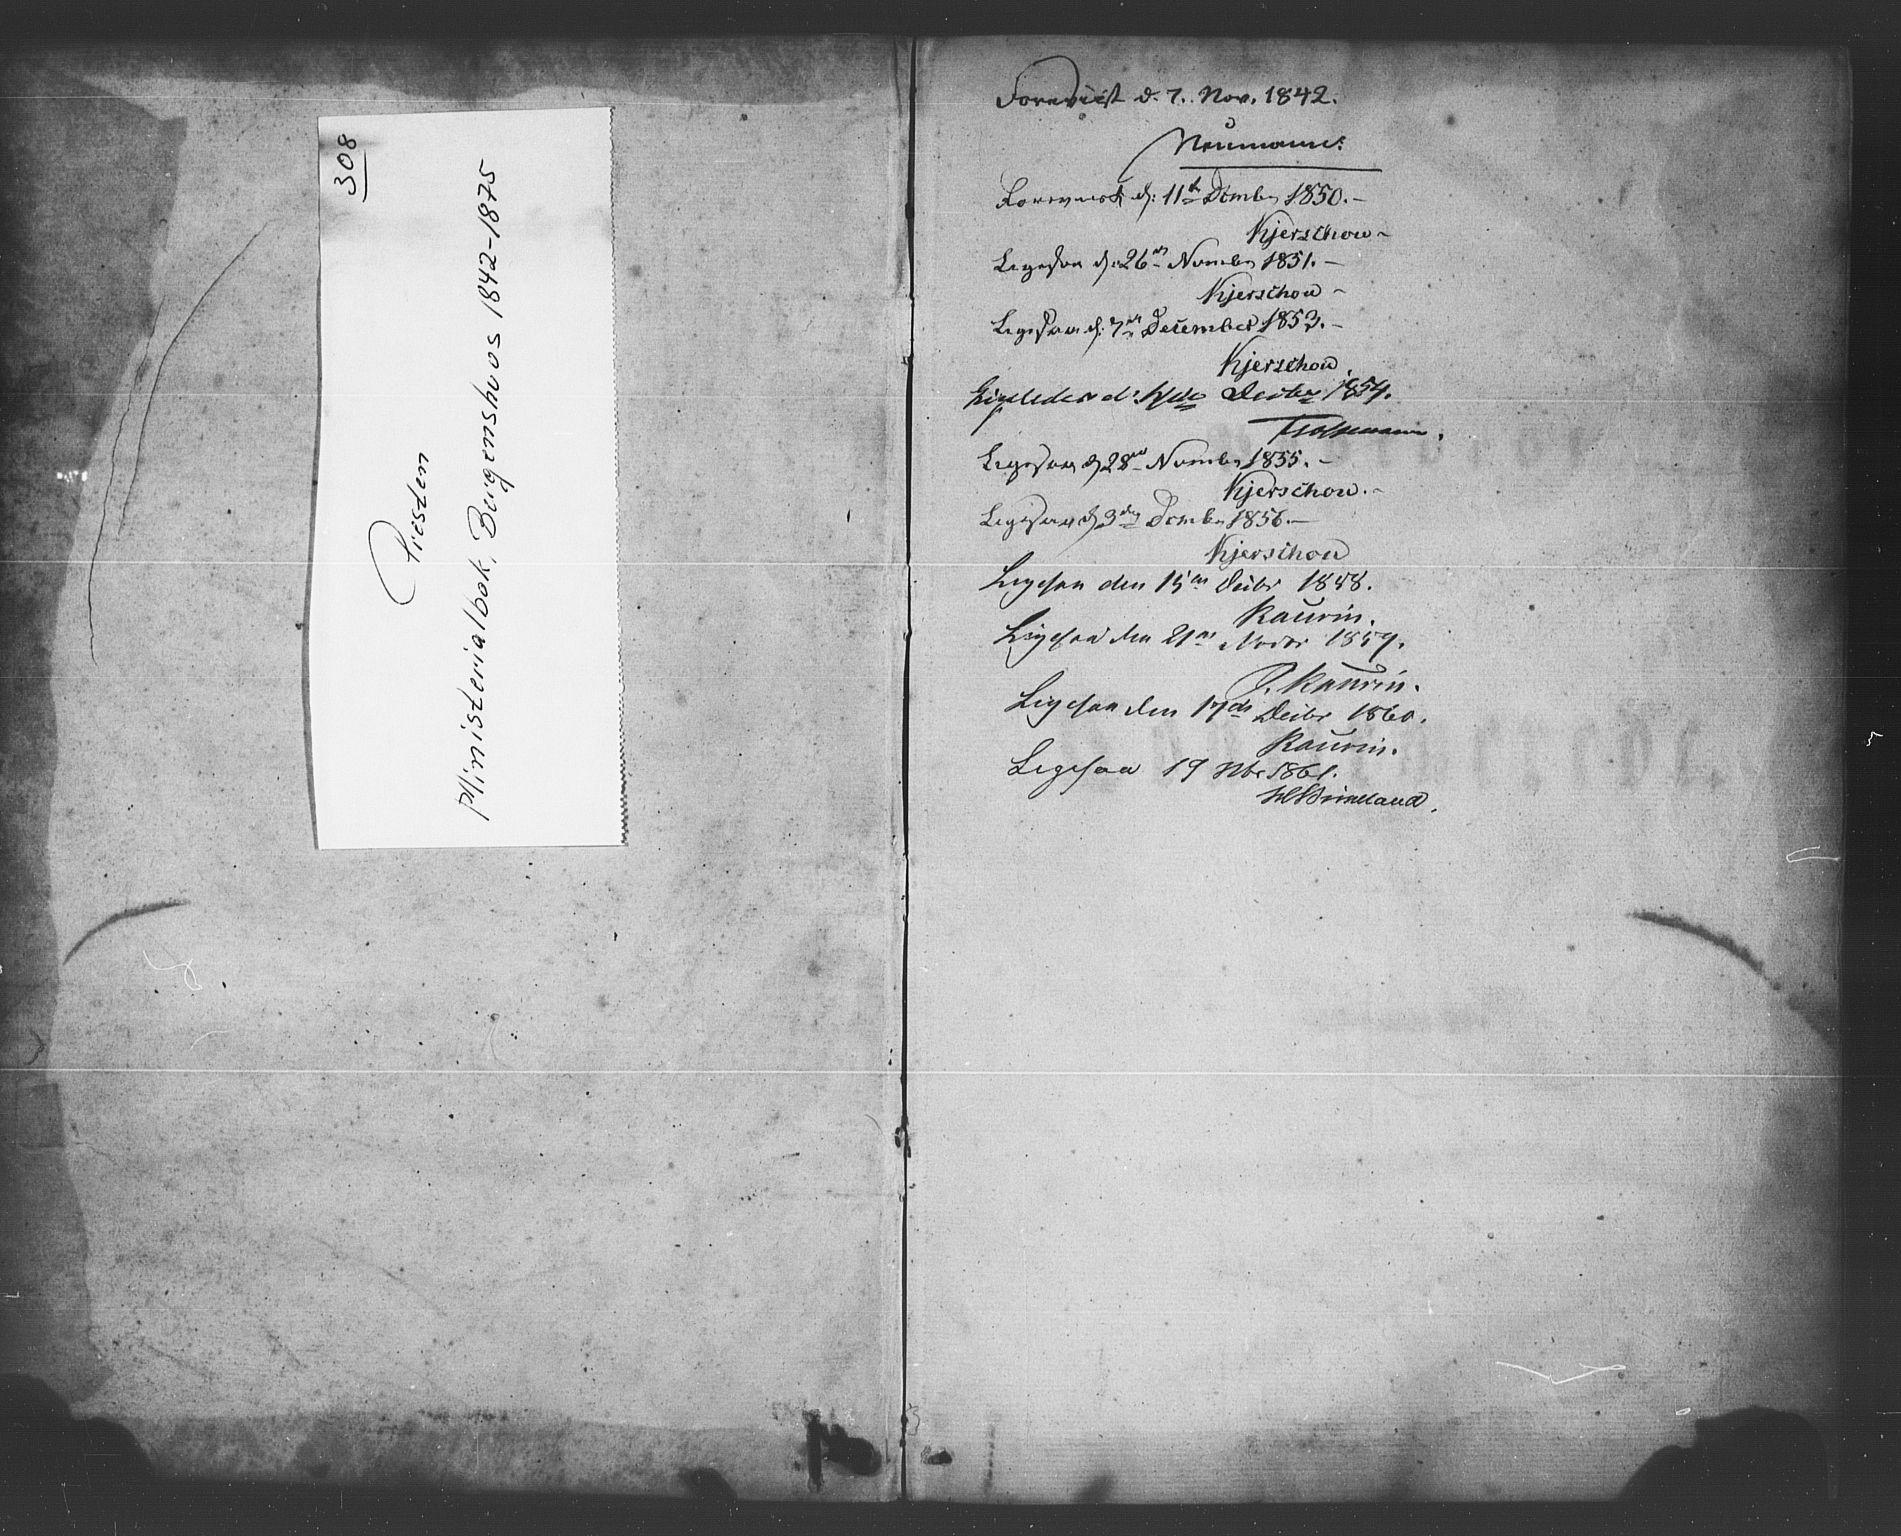 SAB, Bergenhus strafanstalts sokneprestembete*, Ministerialbok nr. A 1, 1841-1875